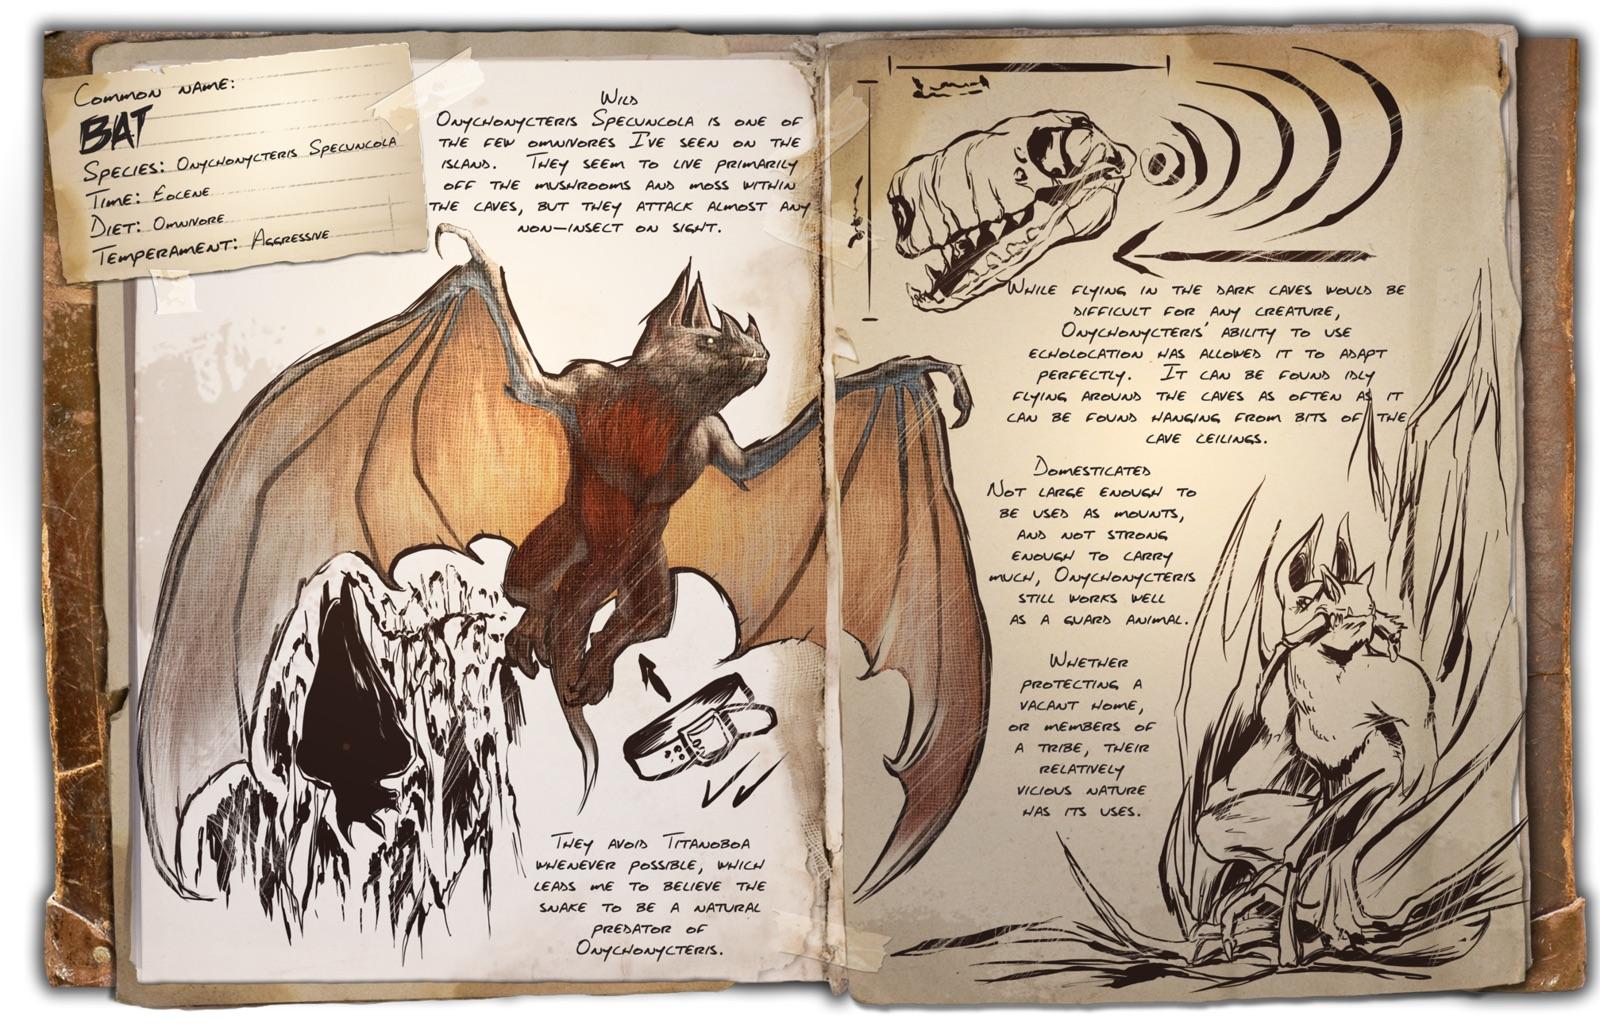 Dino Dossier: Bat